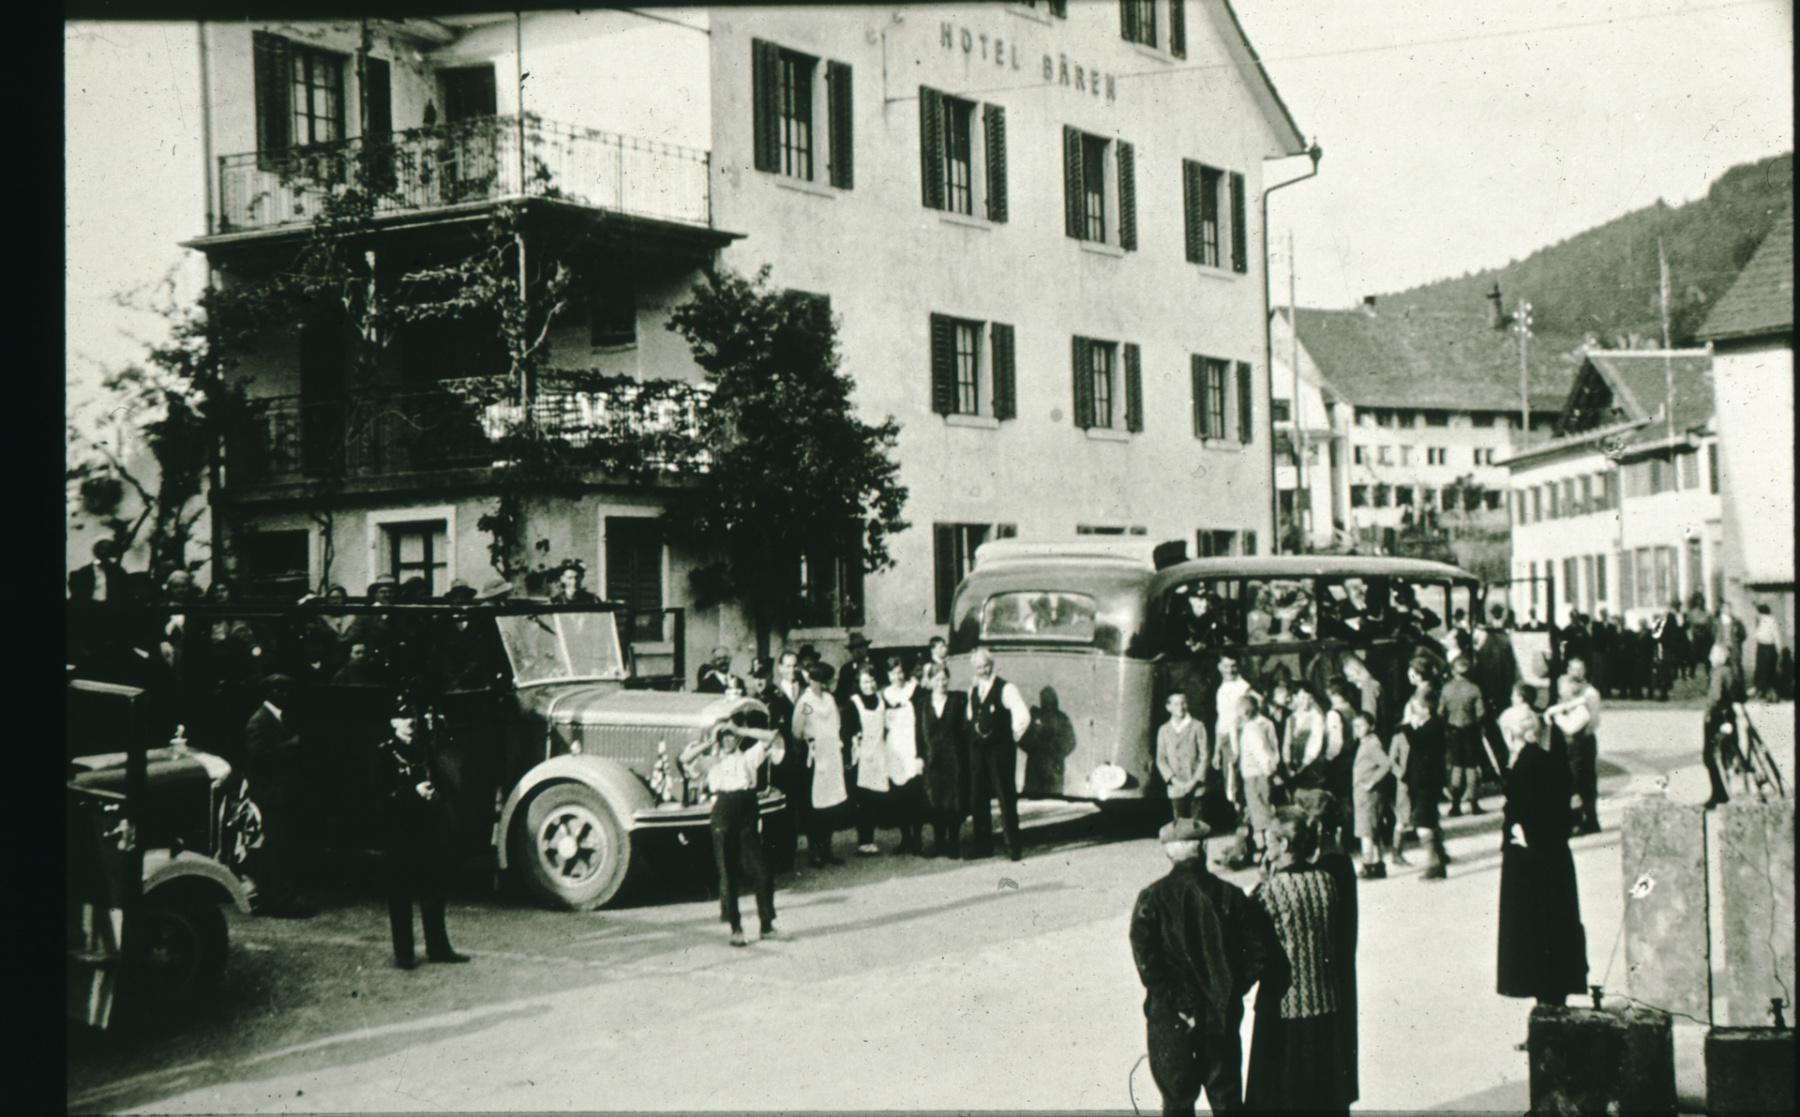 Dorfplatz + Bären mit Grossanlass